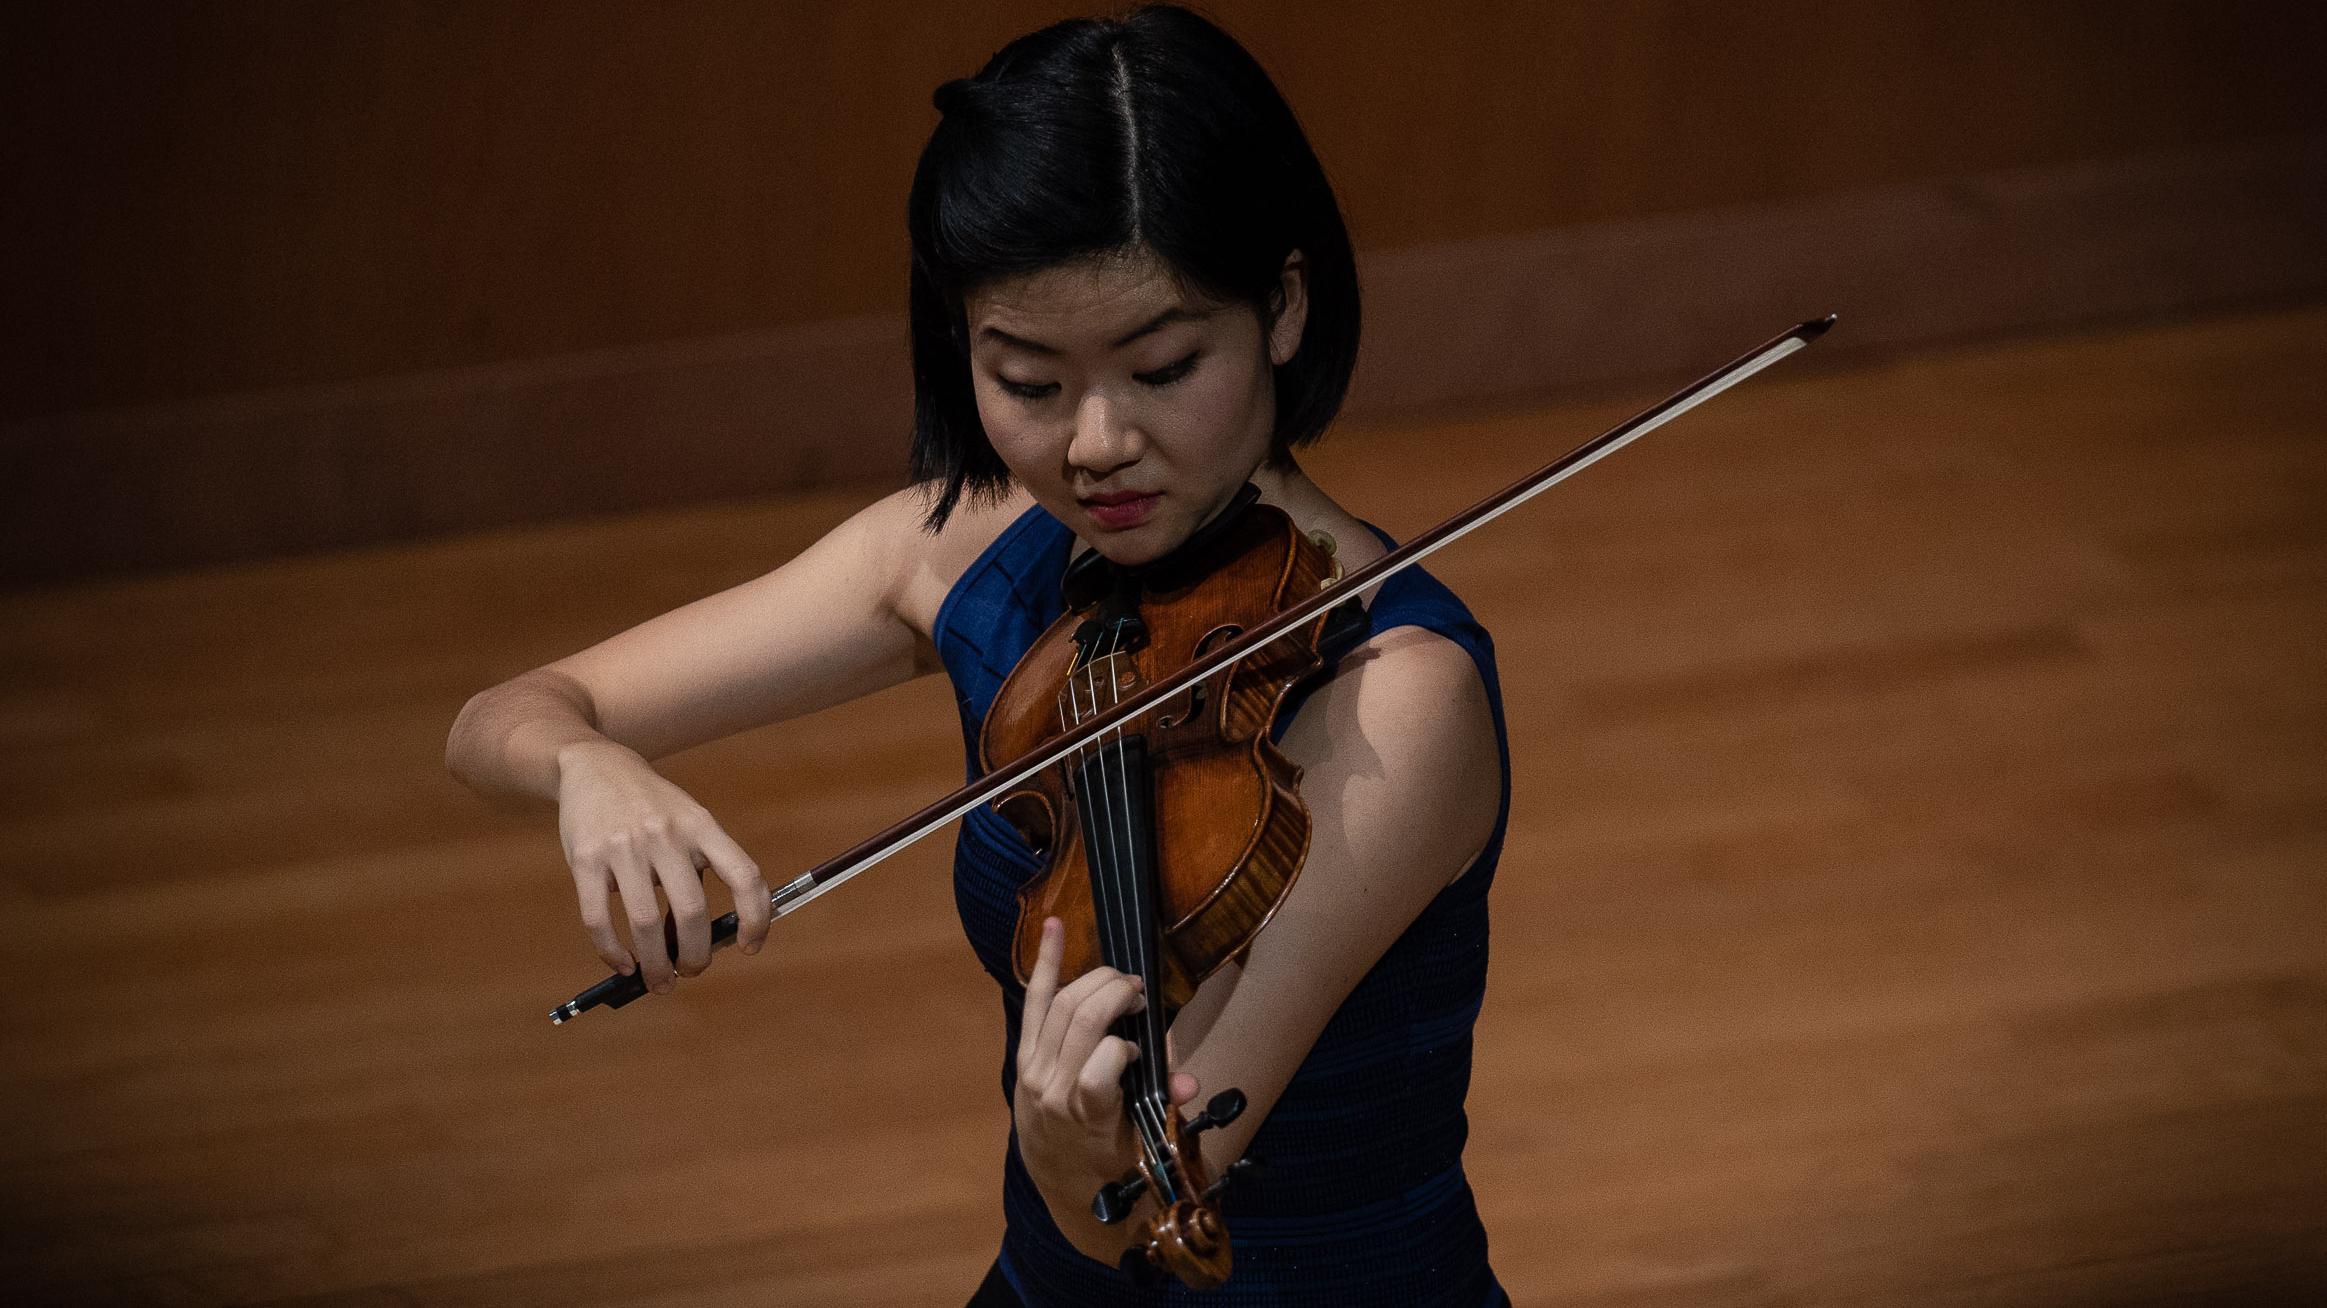 Final del Concurso Internacional Long-Thibaud-Crespin: Recital – (II/II)